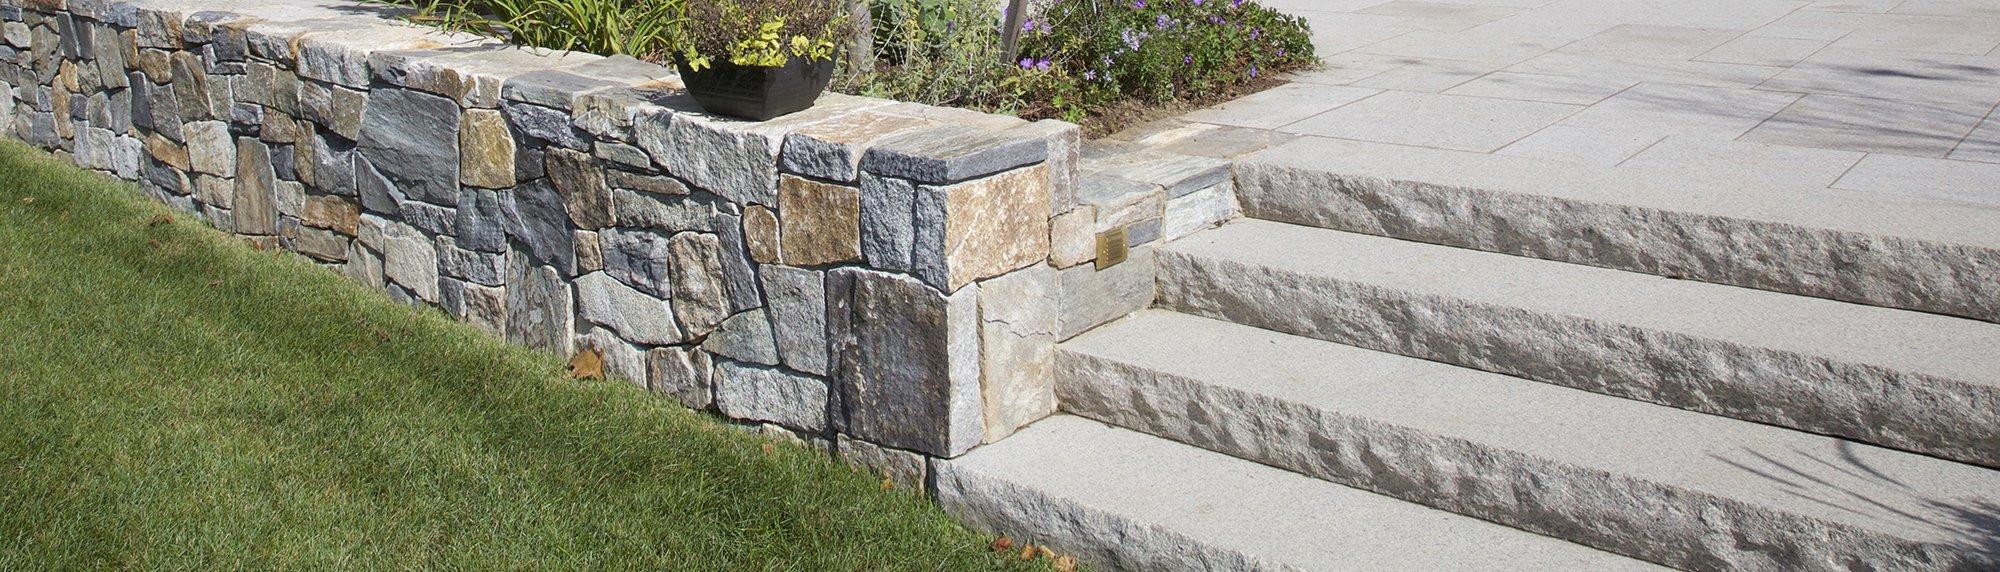 Rockport Mix granite stone retaining wall and Cape Neddick steps